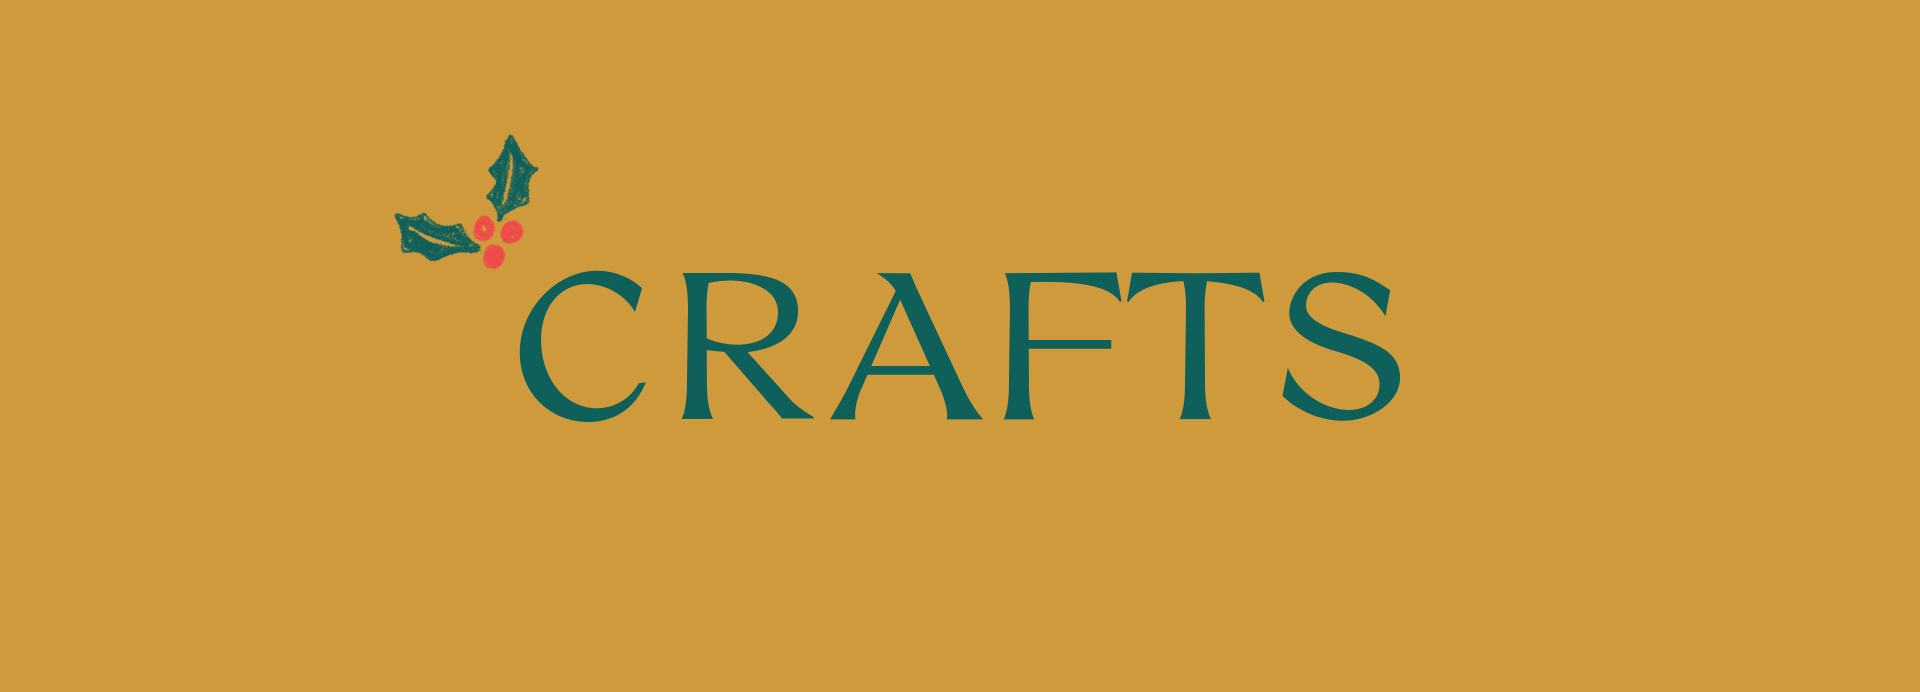 crafts_1920x692